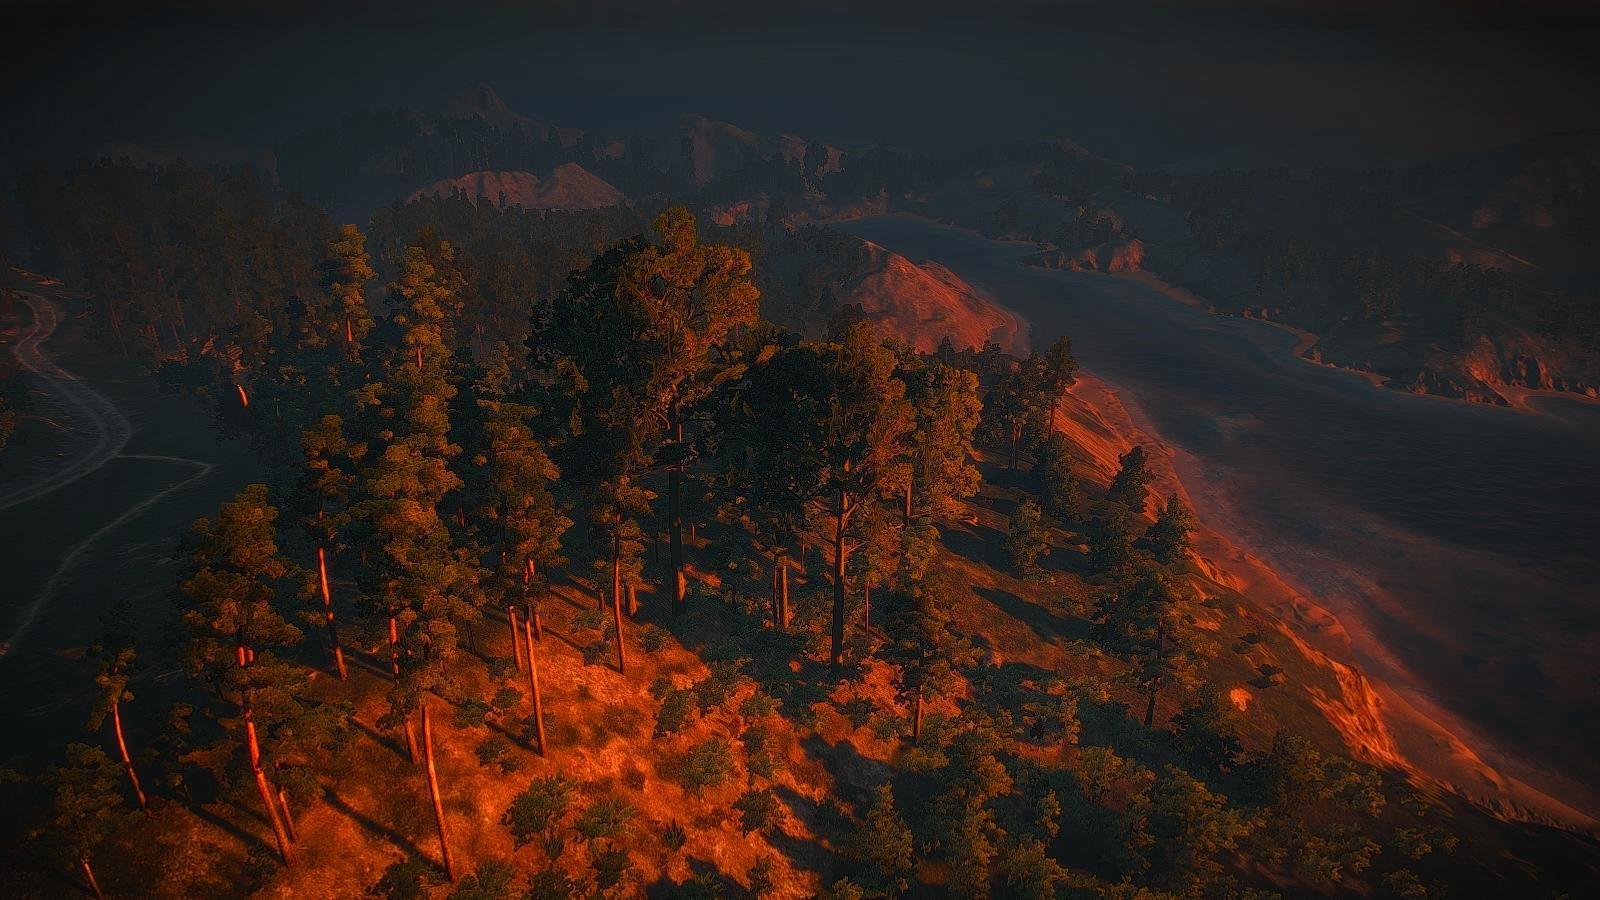 Пейзаж с высоты полёта птицы.. Witcher3